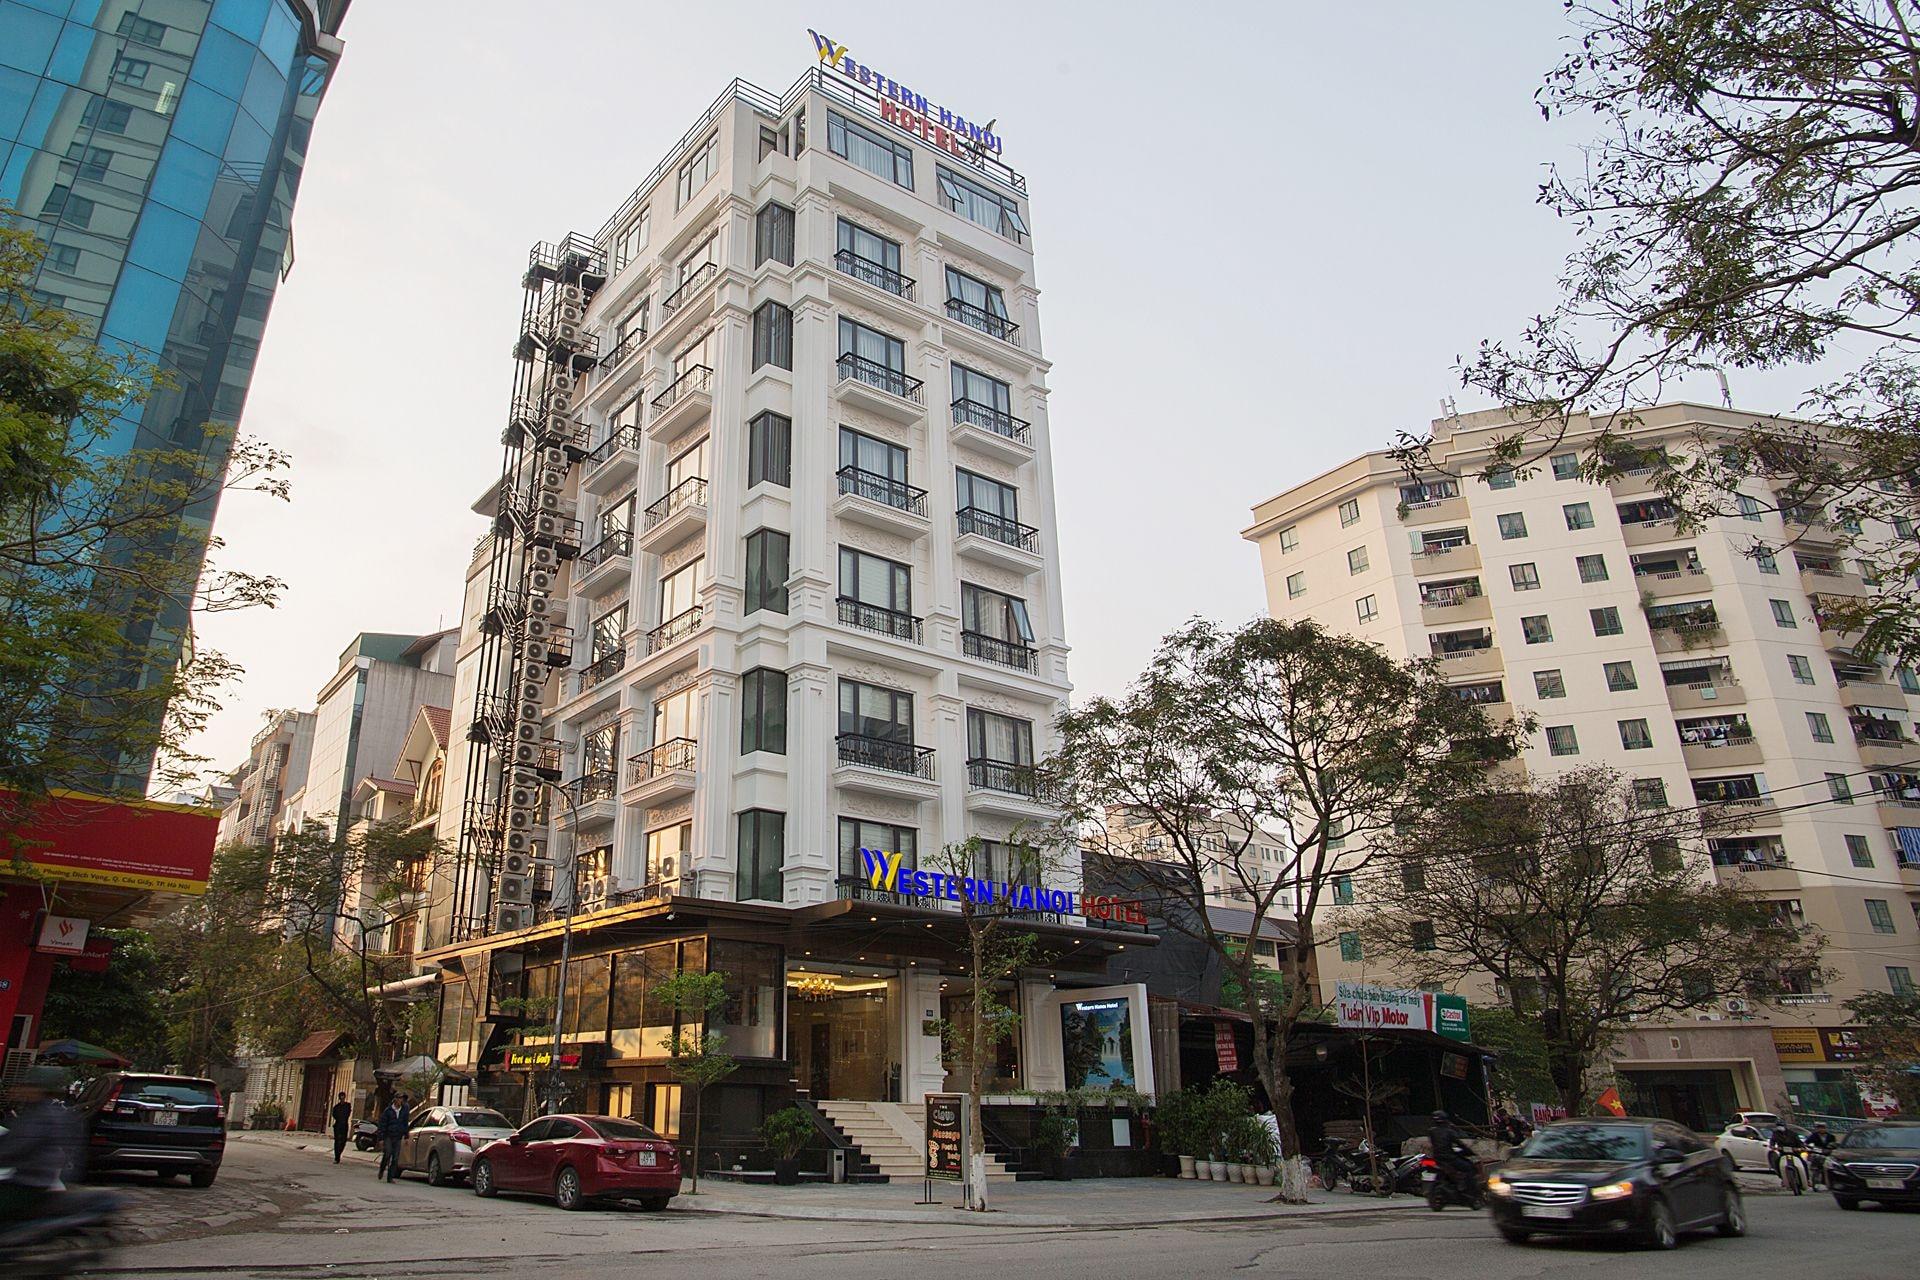 Western Hanoi Boutique Hotel, Cầu Giấy